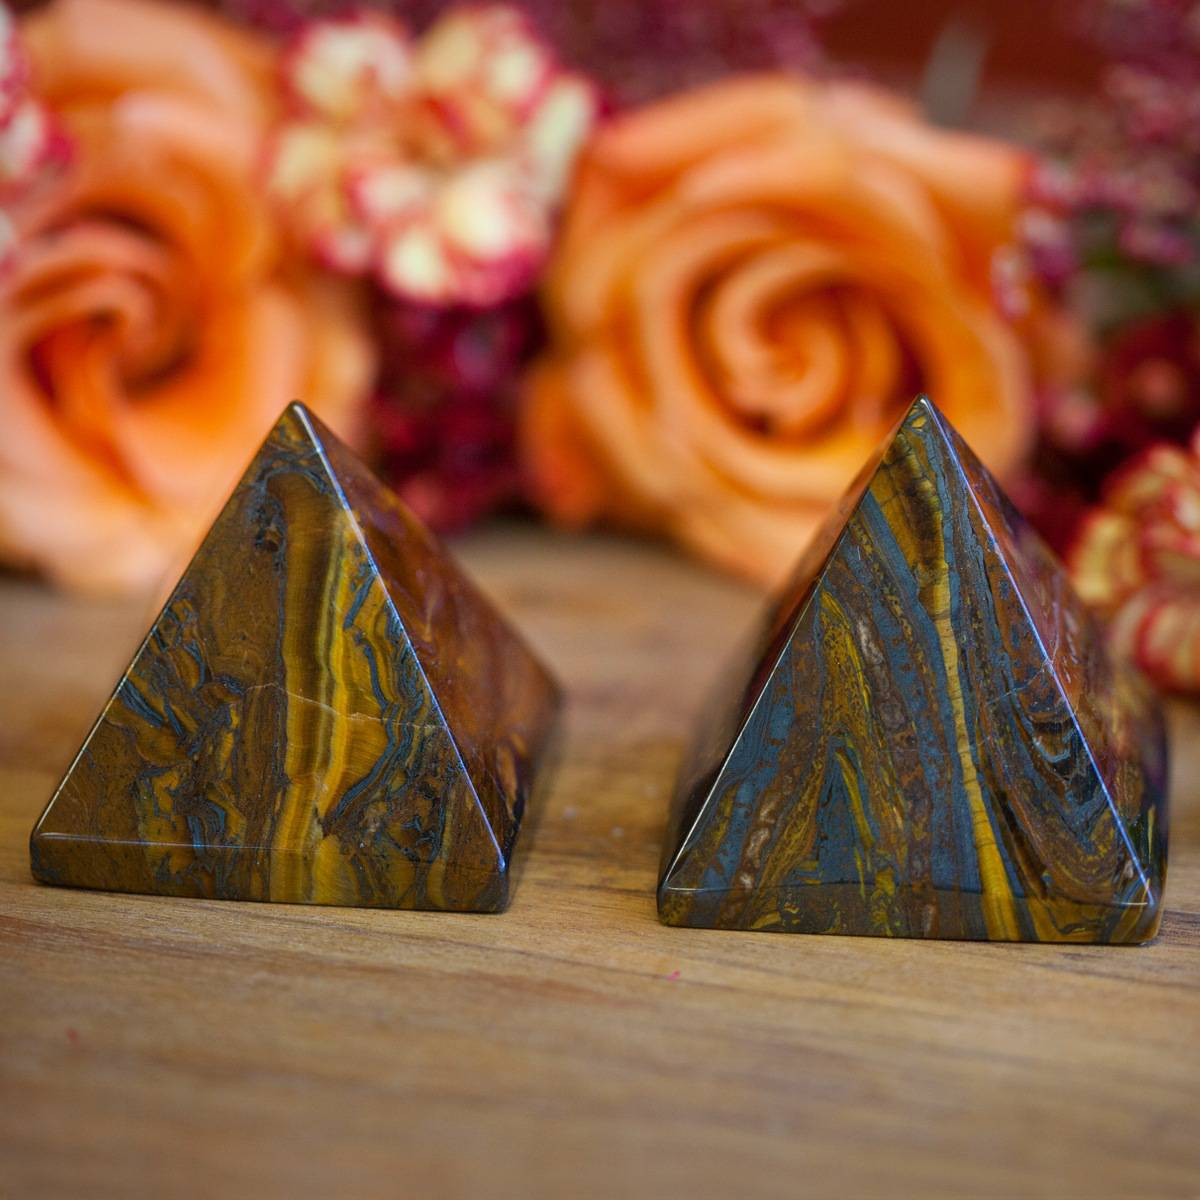 Tiger Iron Master Healing Pyramids 1_6